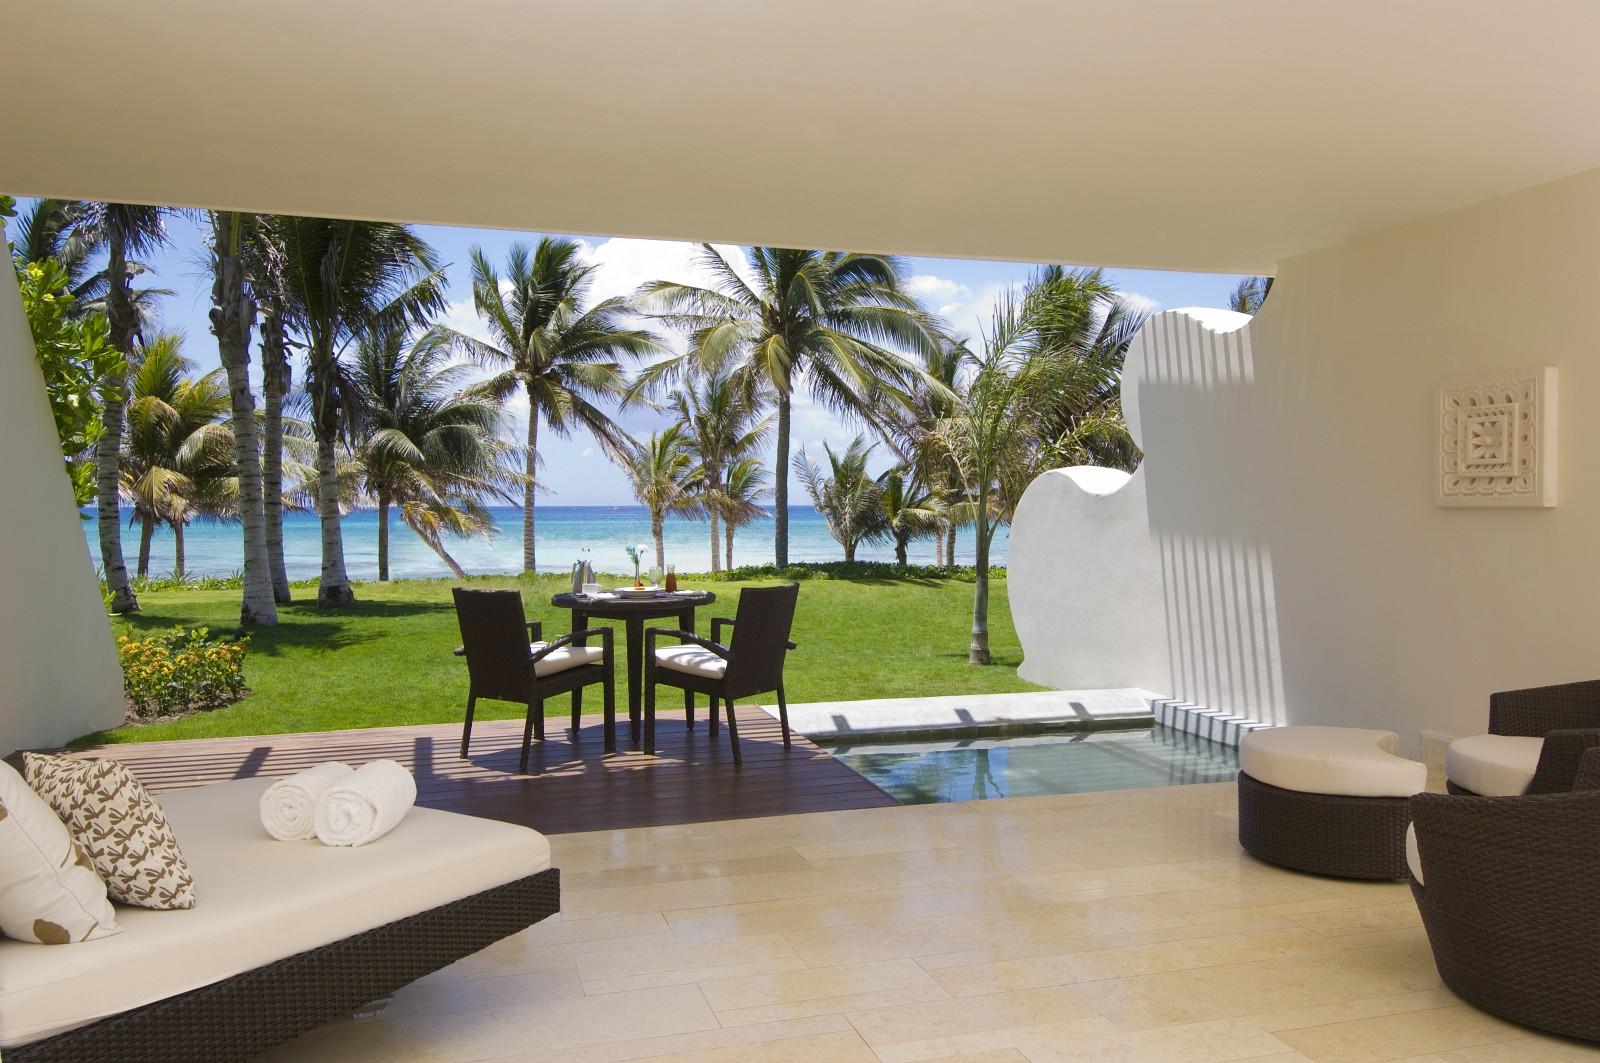 Travel Agency All-Inclusive Resort Grand Velas Riviera Maya 037